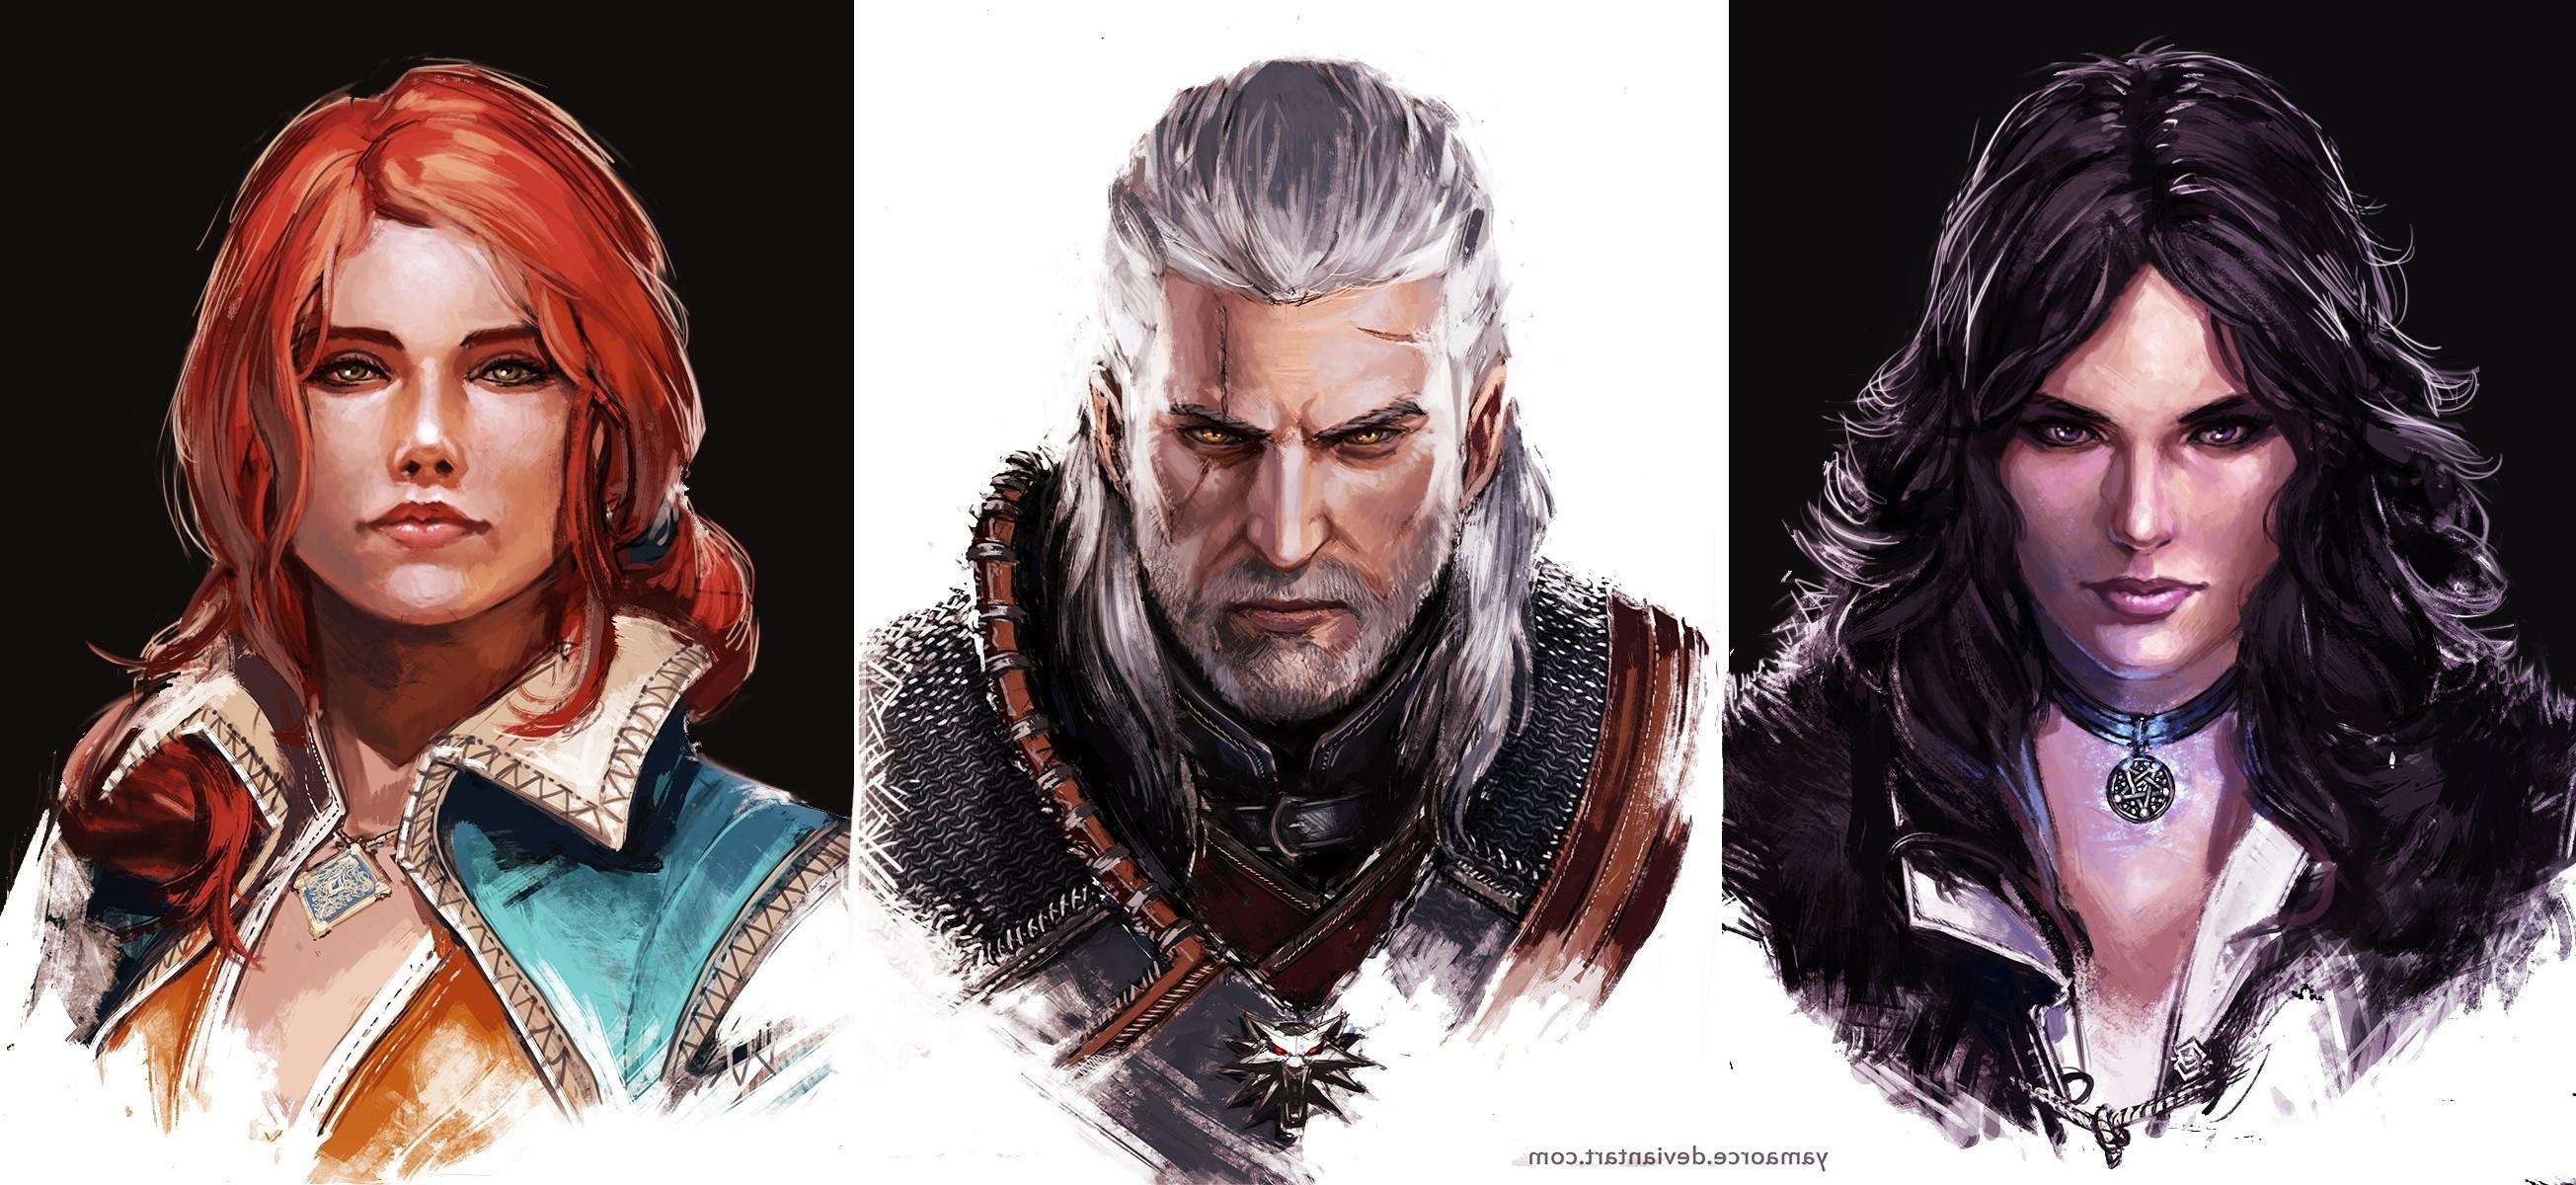 The Witcher 3: Wild Hunt, Geralt Of Rivia, Yennefer Of Vengerberg, Triss  Merigold Wallpapers HD / Desktop and Mobile Backgrounds